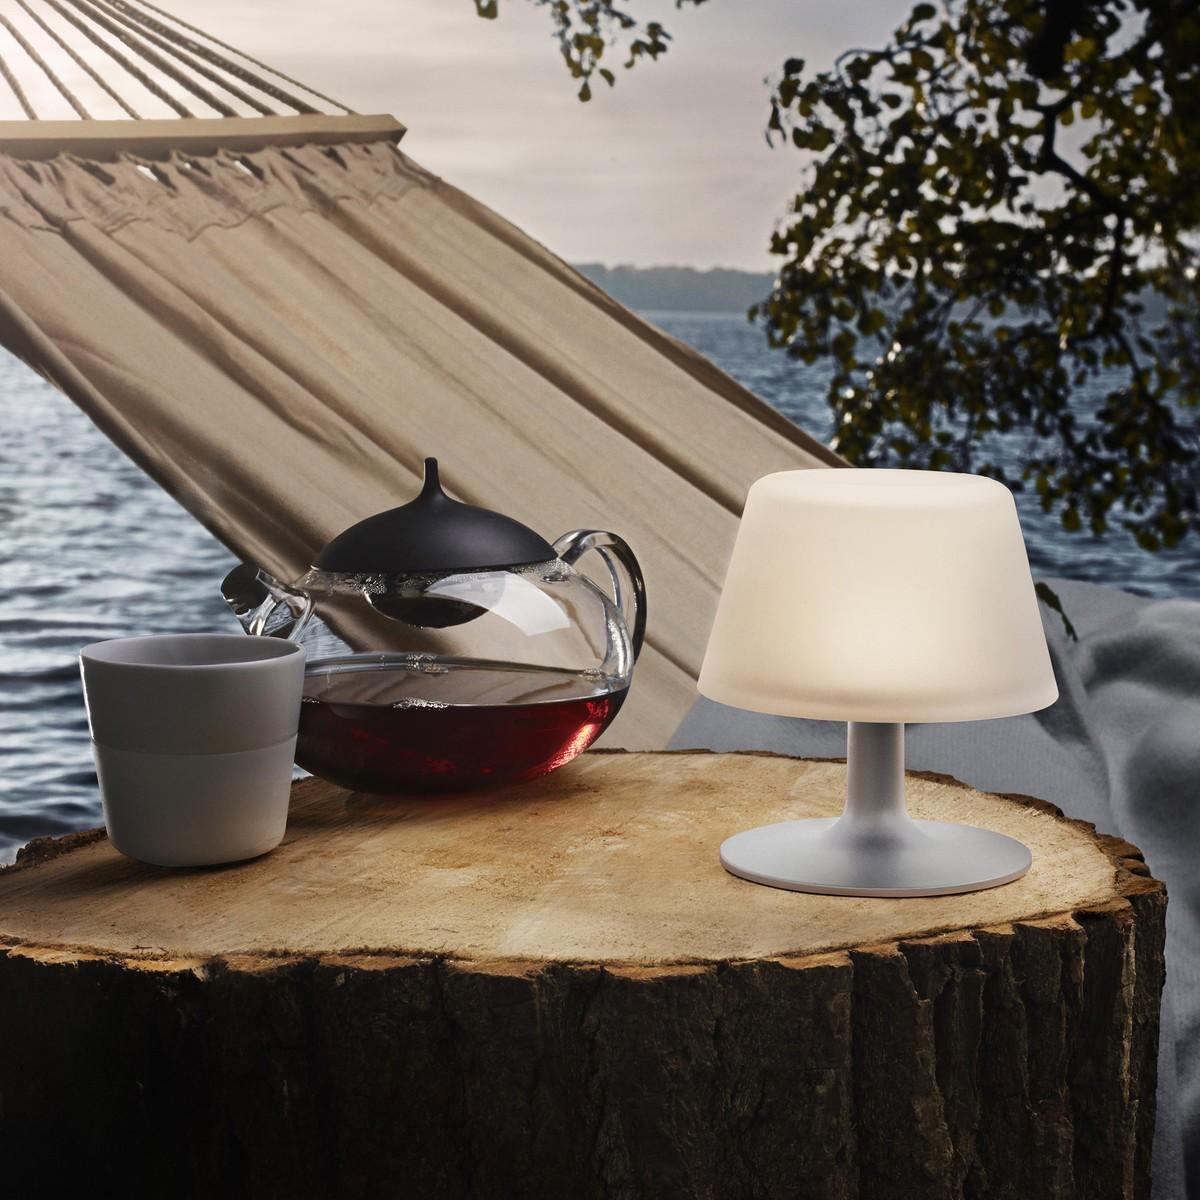 eva solo sunlight led energie solaire eva solo. Black Bedroom Furniture Sets. Home Design Ideas